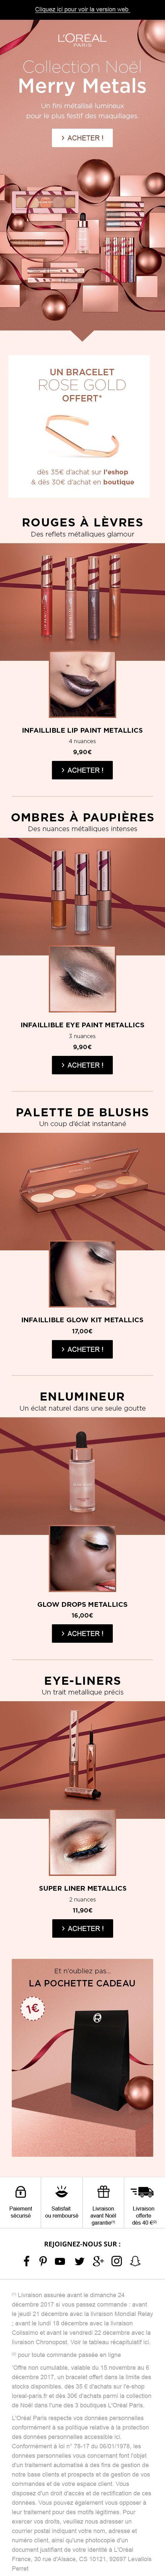 #lorealparis #newsletter  #emailing#loreal #cosmetics #merrymetals #rosegold #beauty #makeup #lip #eyes #christmas